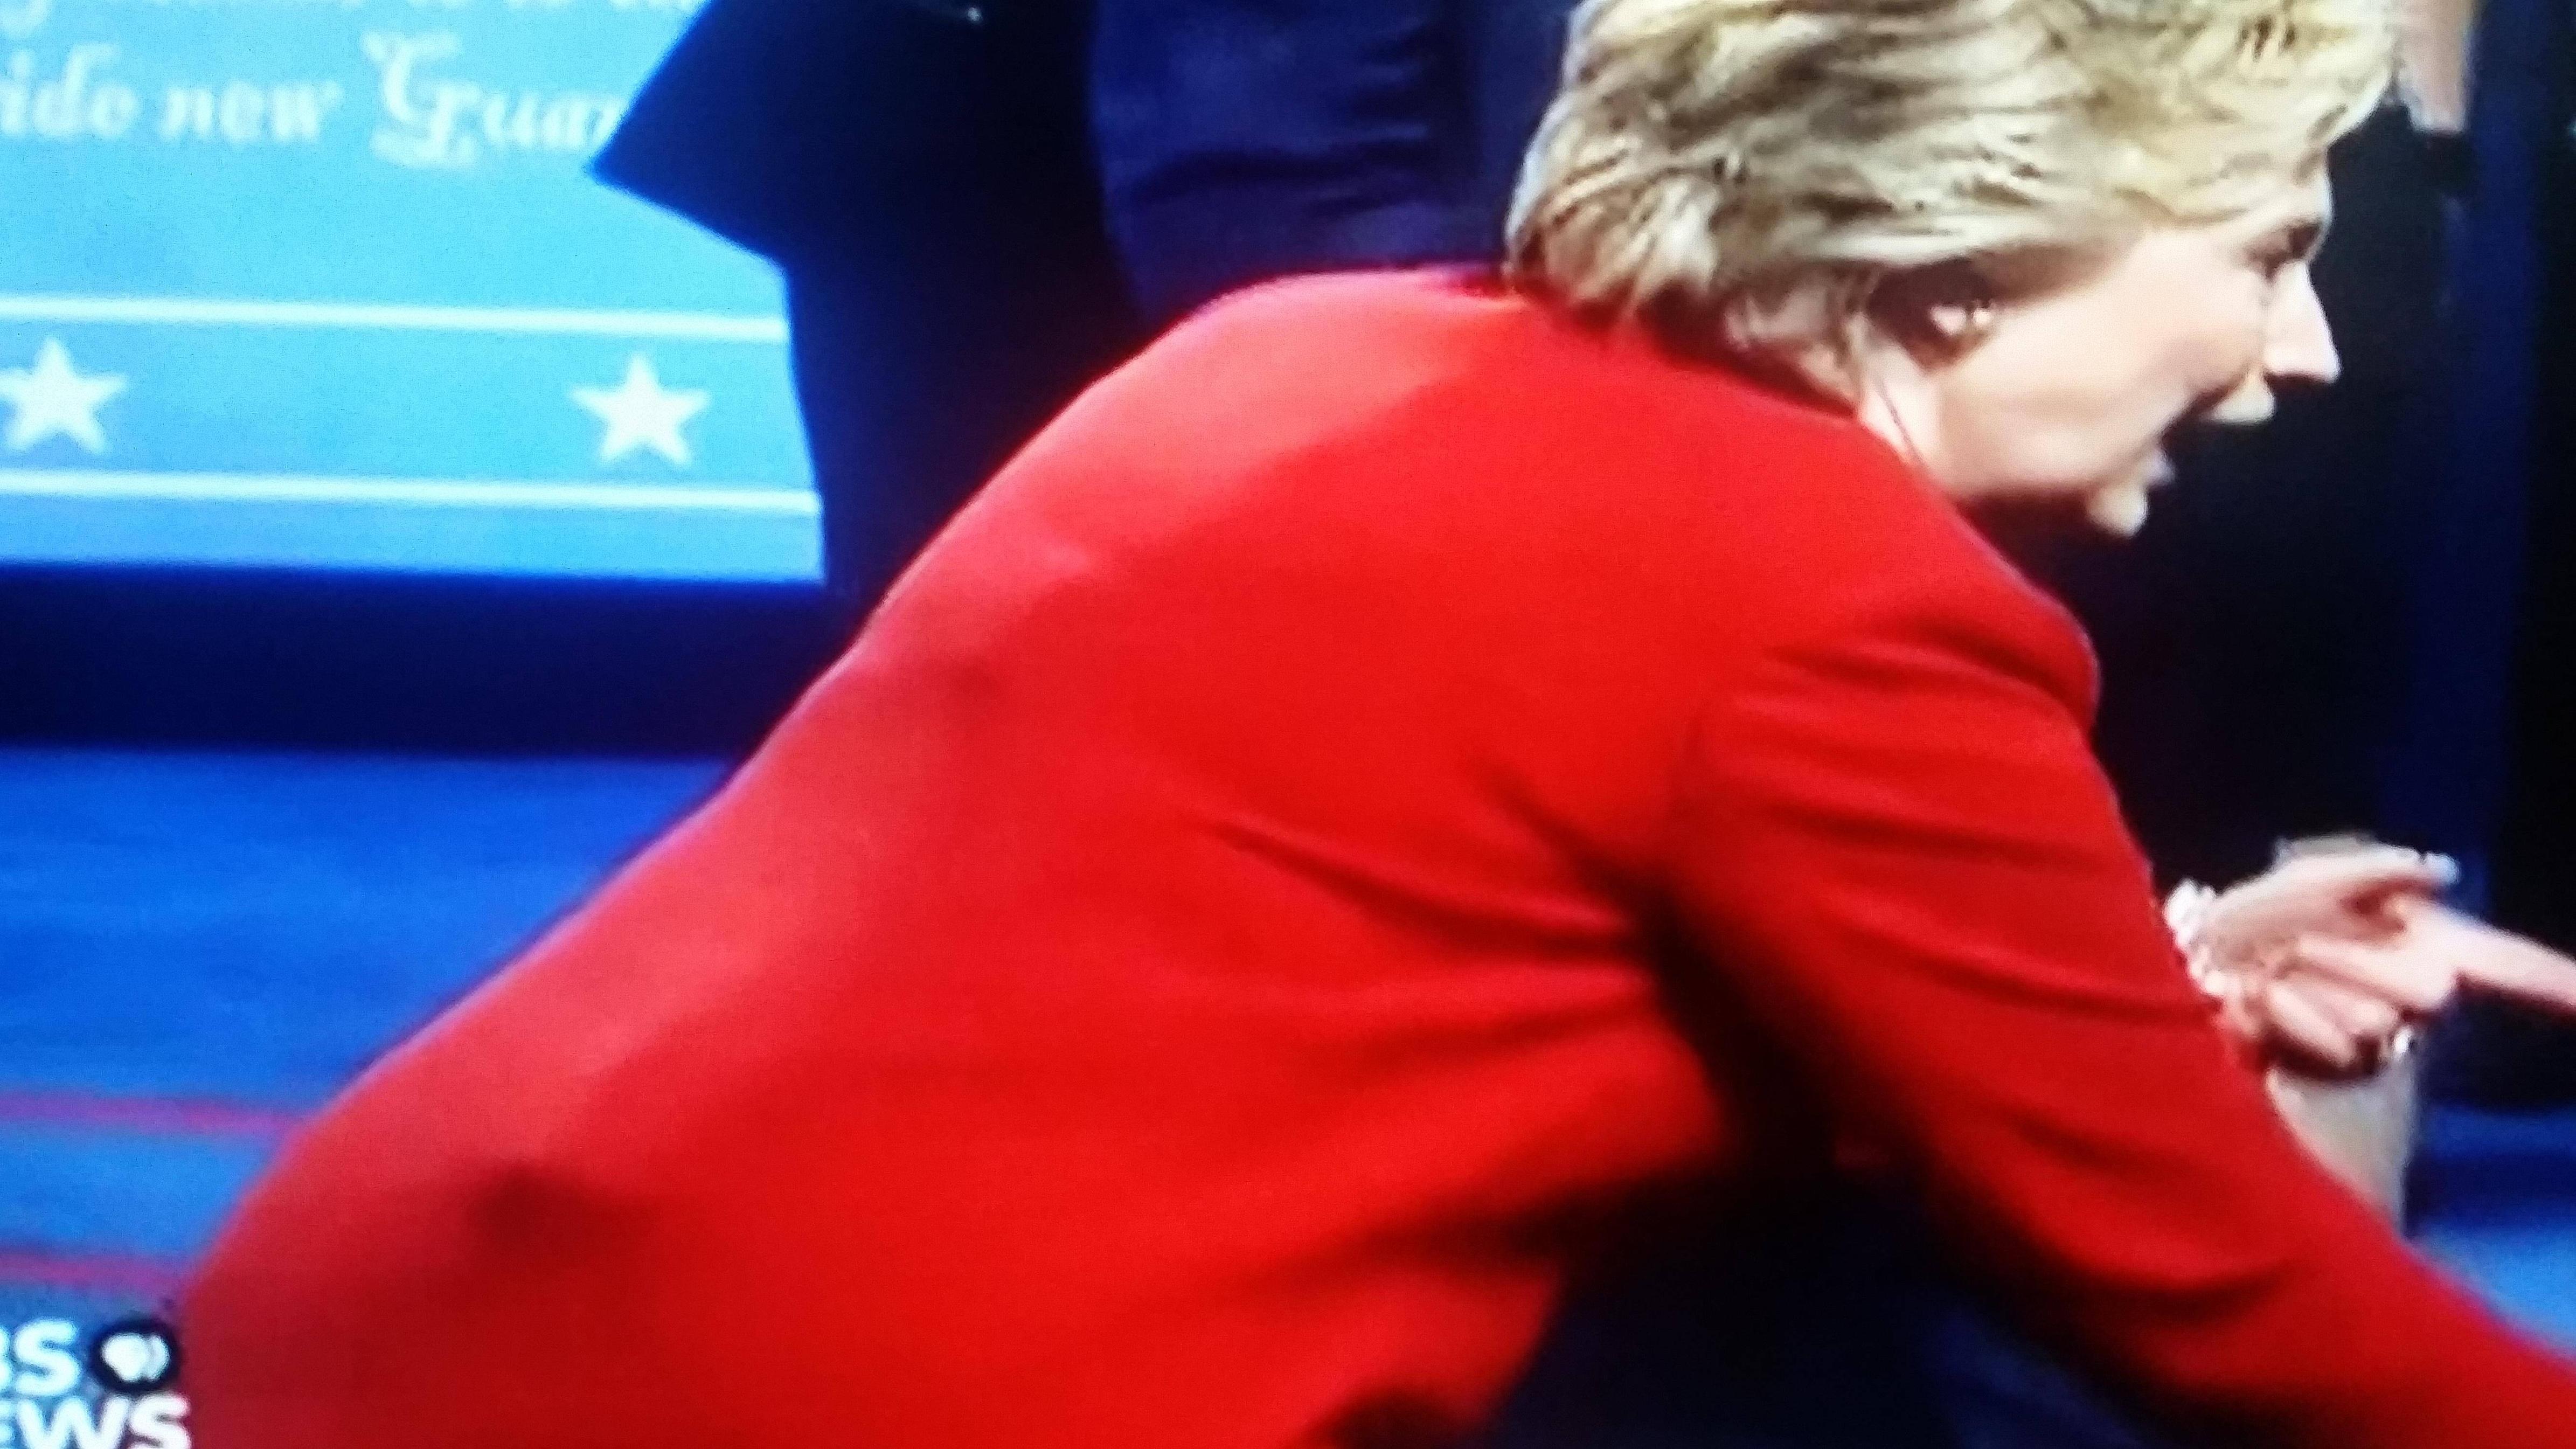 4chan debate hillary-clinton hillary-device hillary-earpiece how-does-a-lavalier-mic-work lol pol presidential-debate